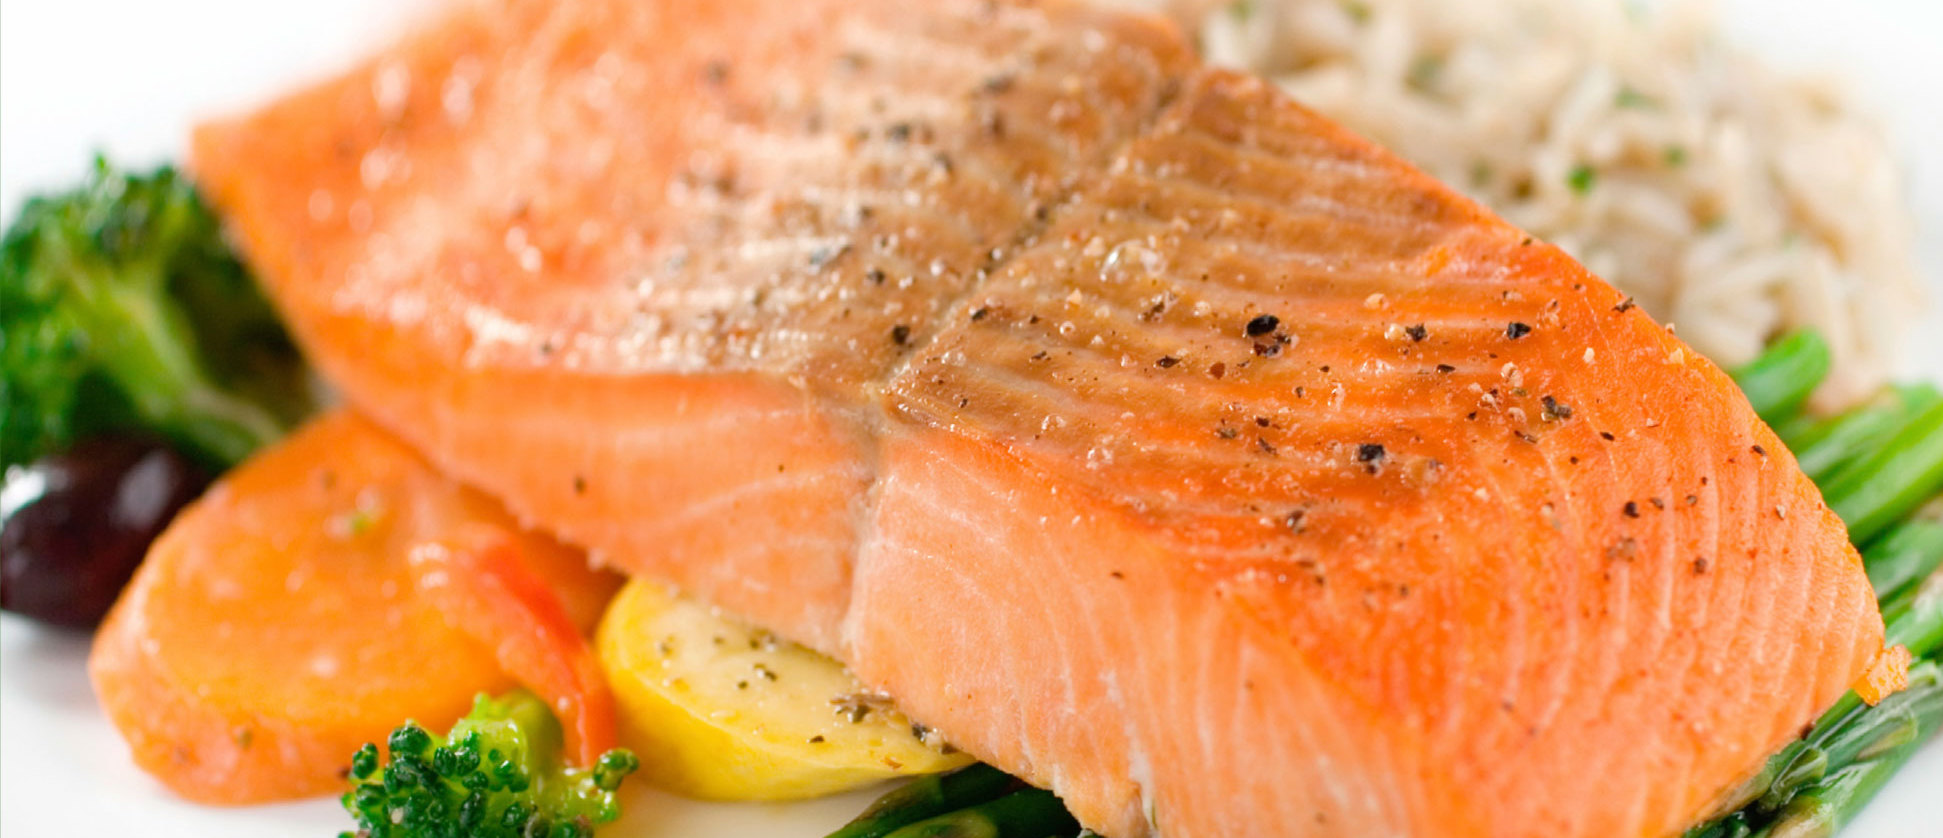 health-benefits-of-omega-3-fatty-acids-salmon